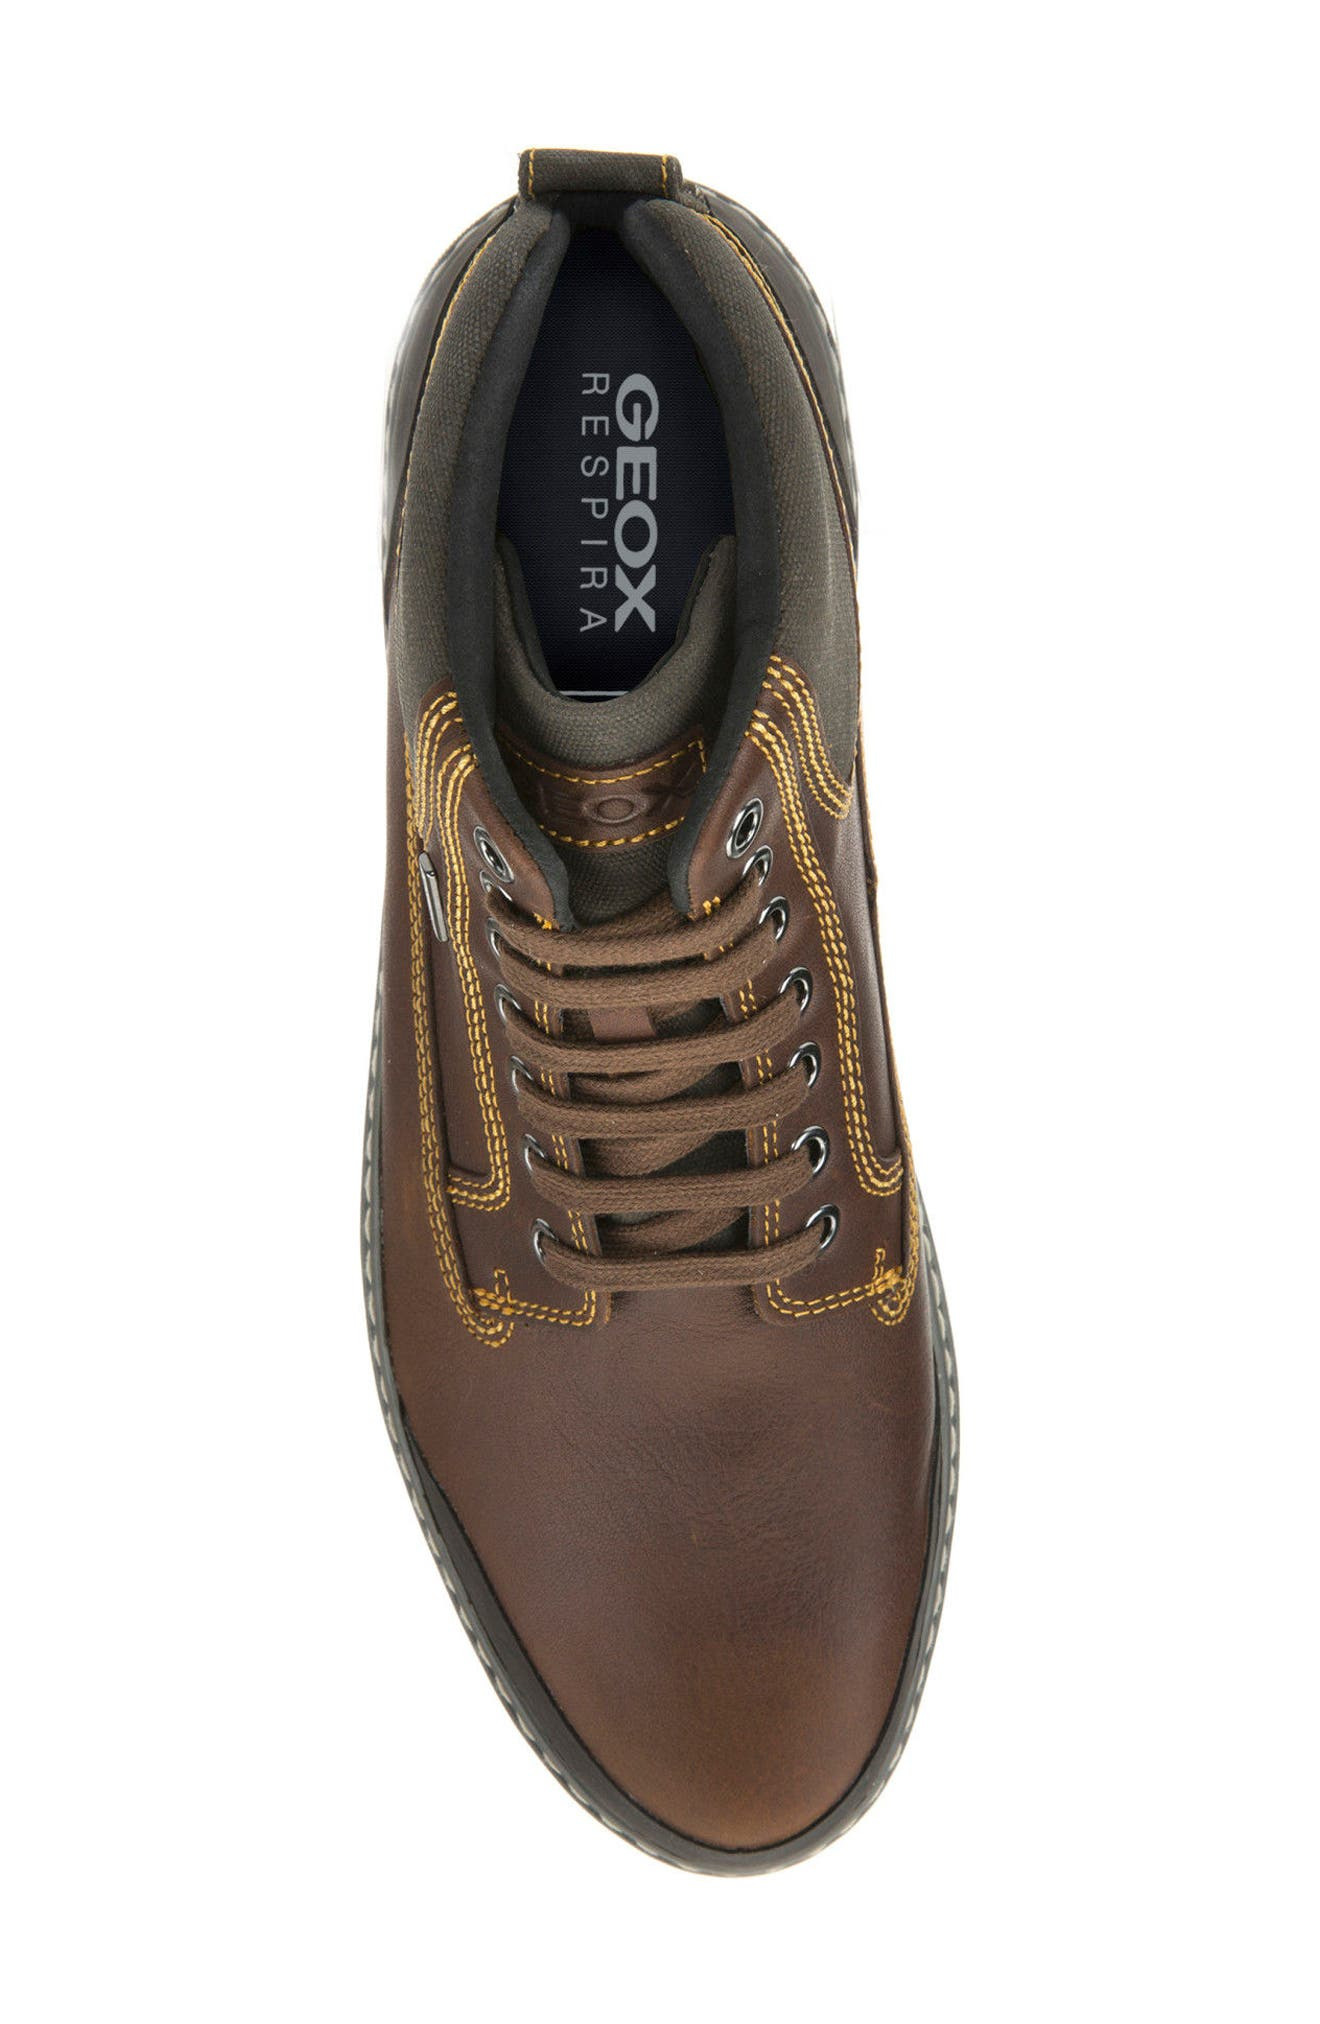 Mattias Amphibiox Waterproof Leather Sneaker,                             Alternate thumbnail 5, color,                             BROWN/ BROWN